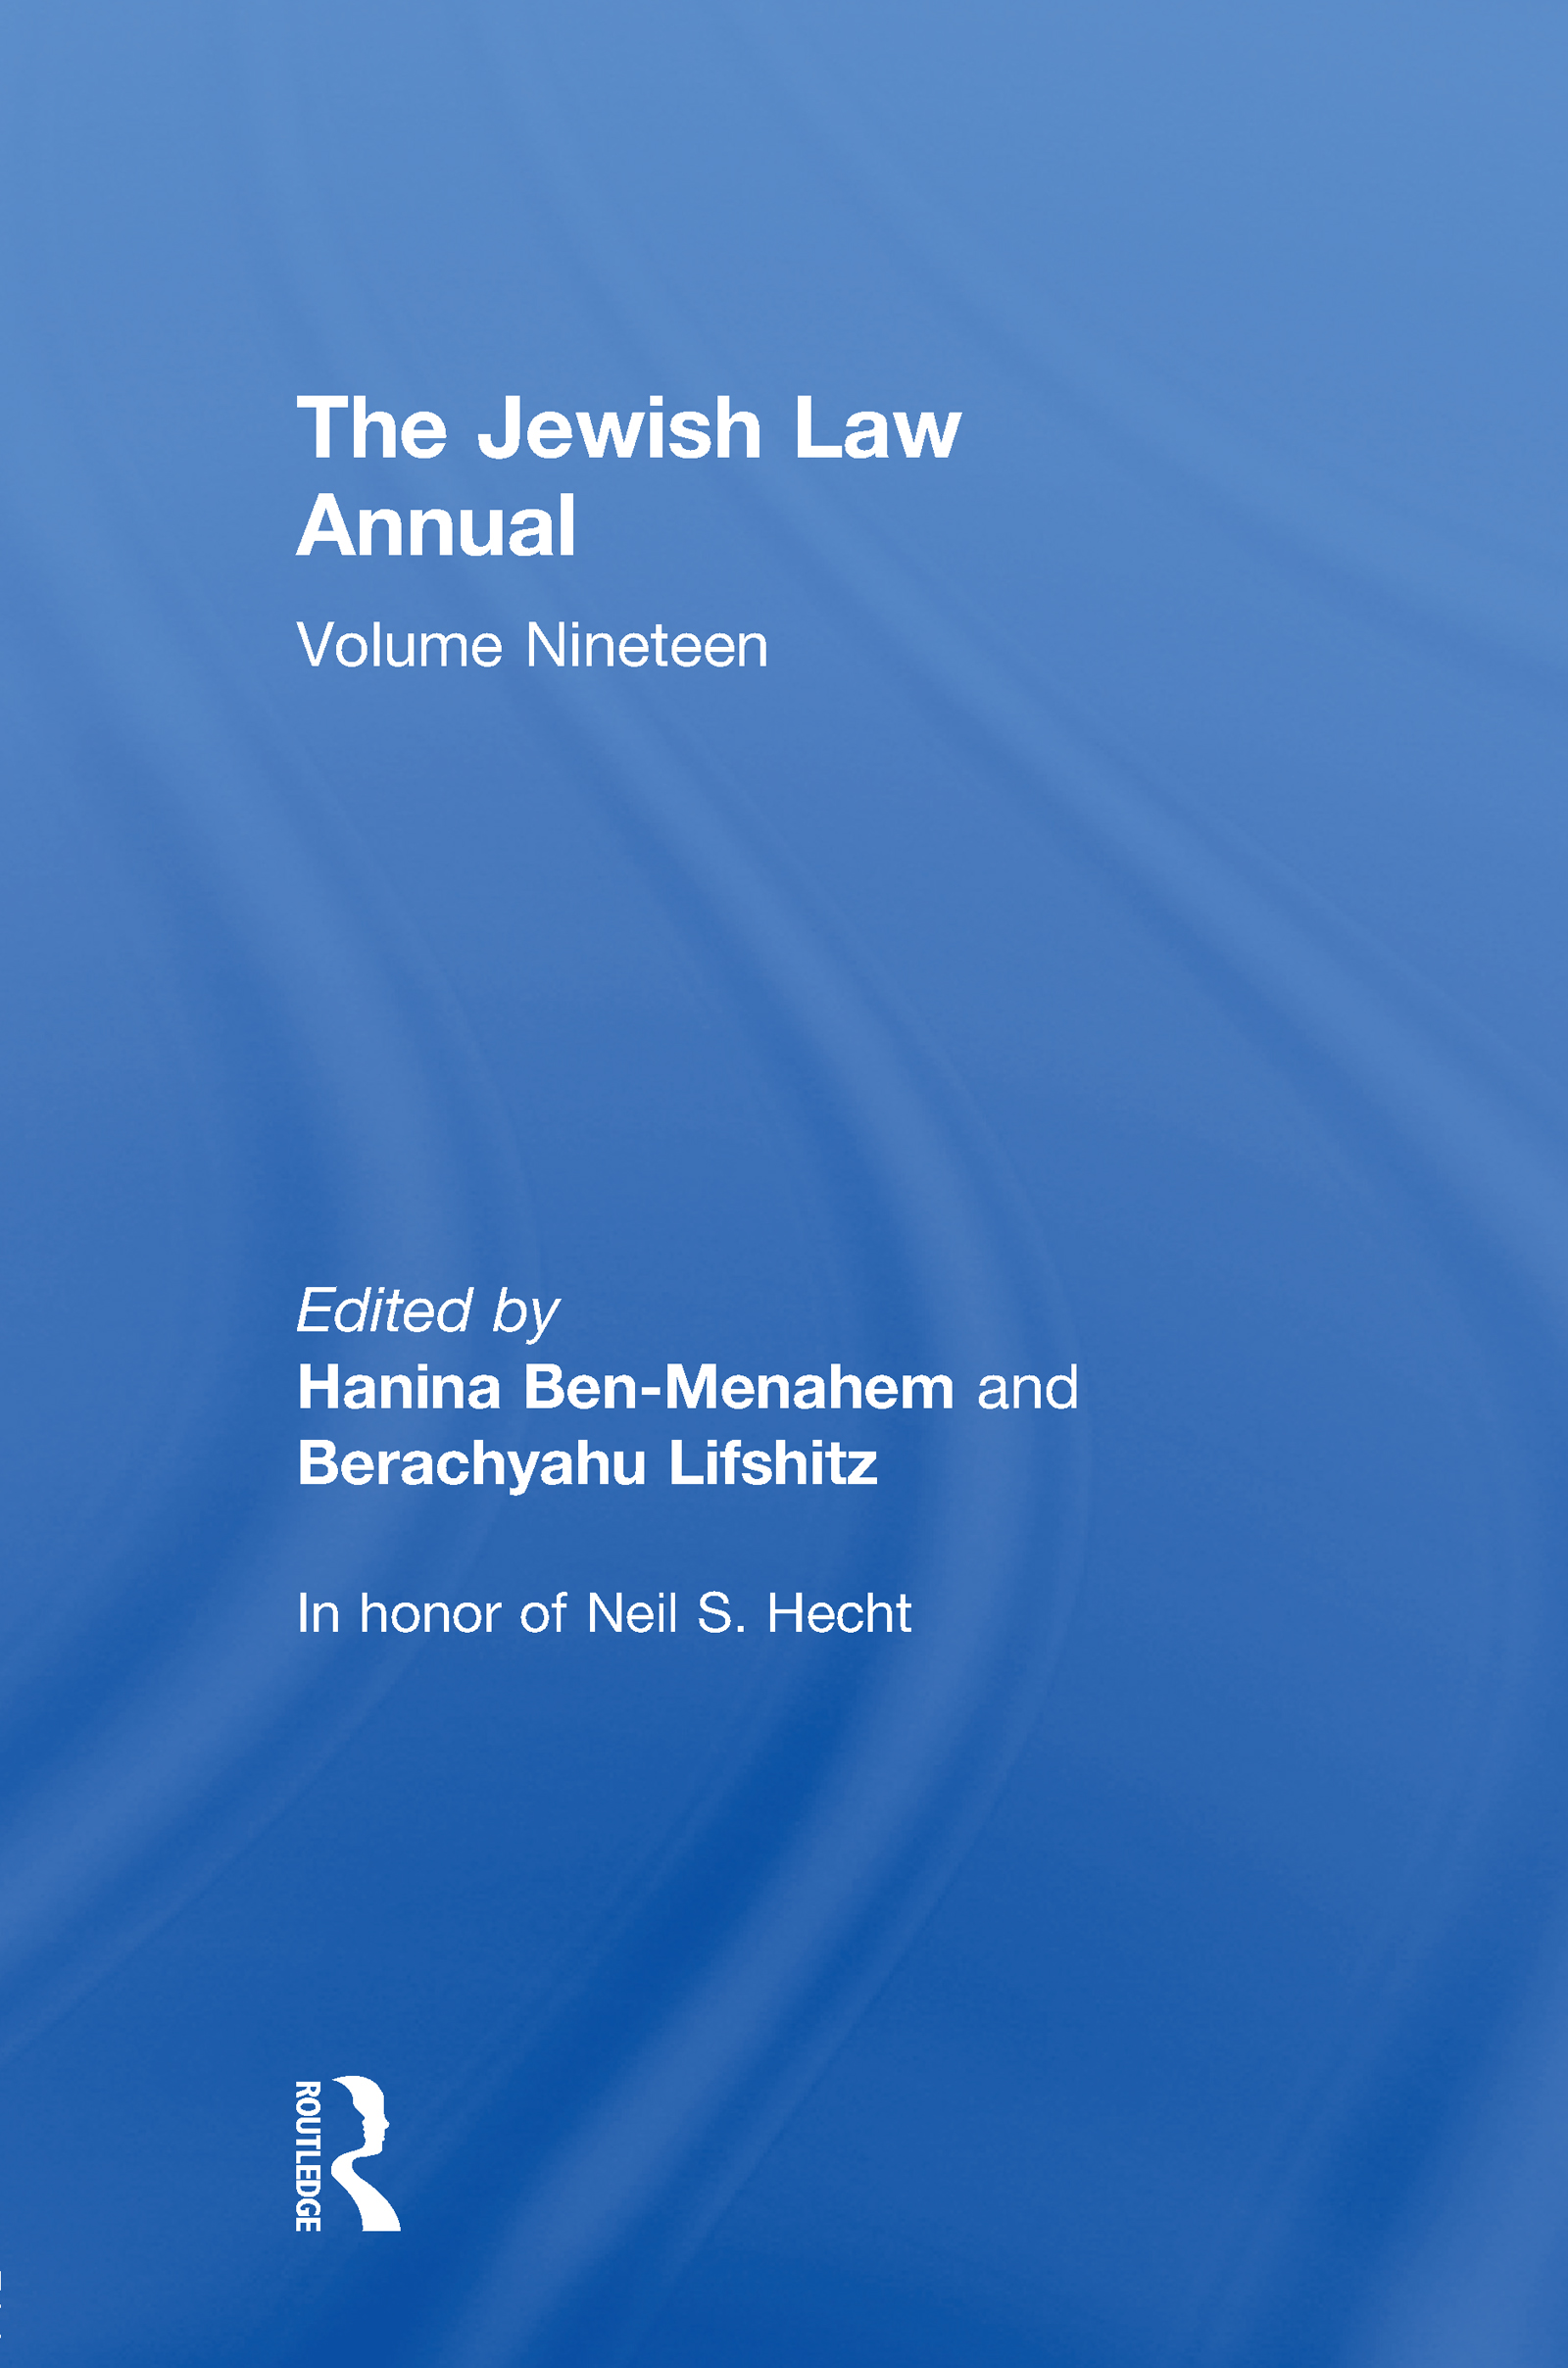 The Jewish Law Annual Volume 19